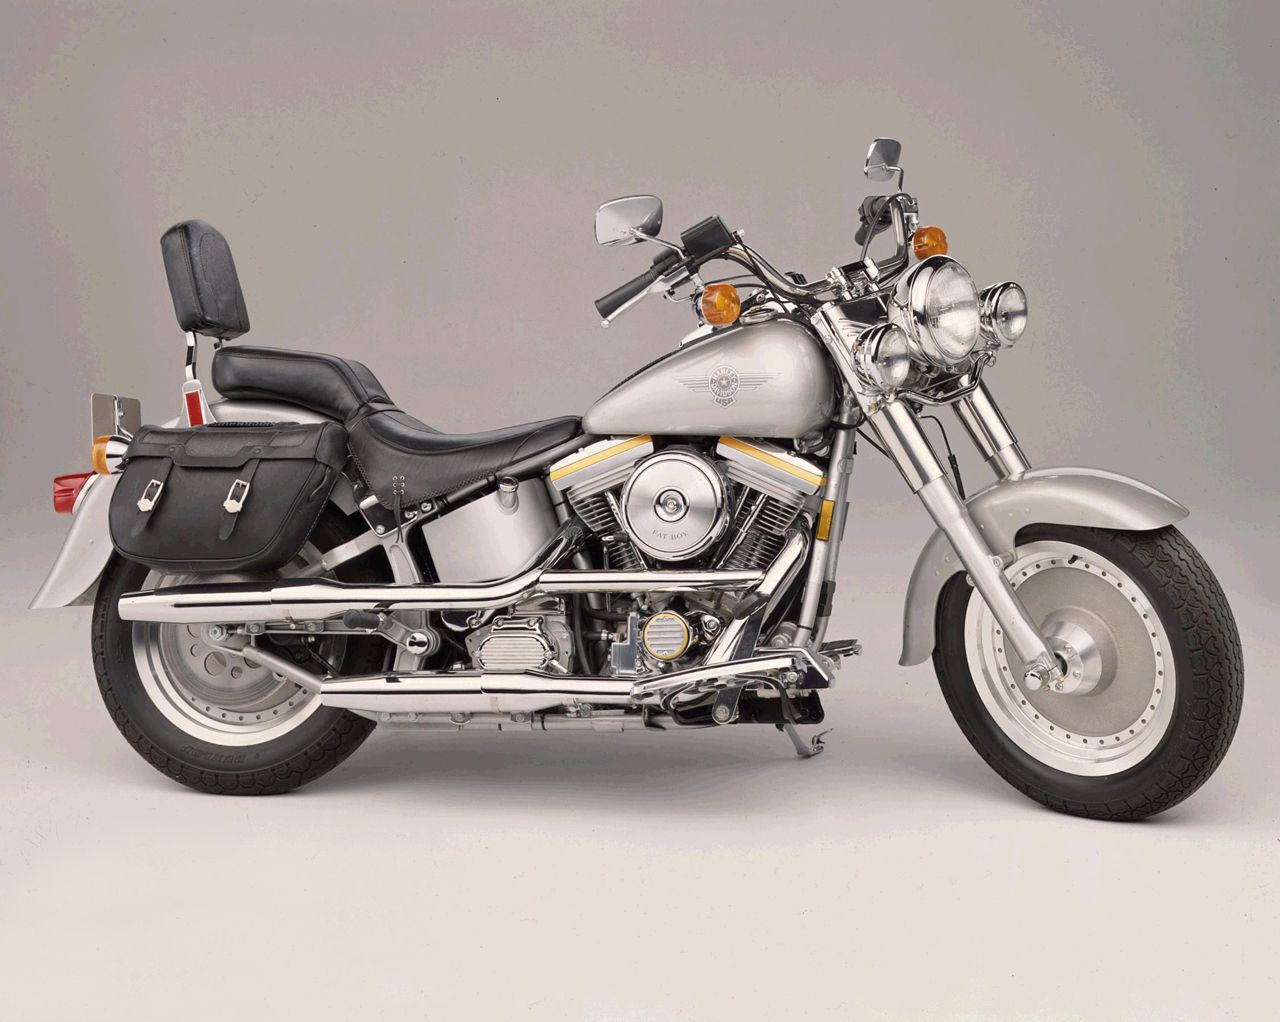 1990 Harley-Davidson Fat Boy